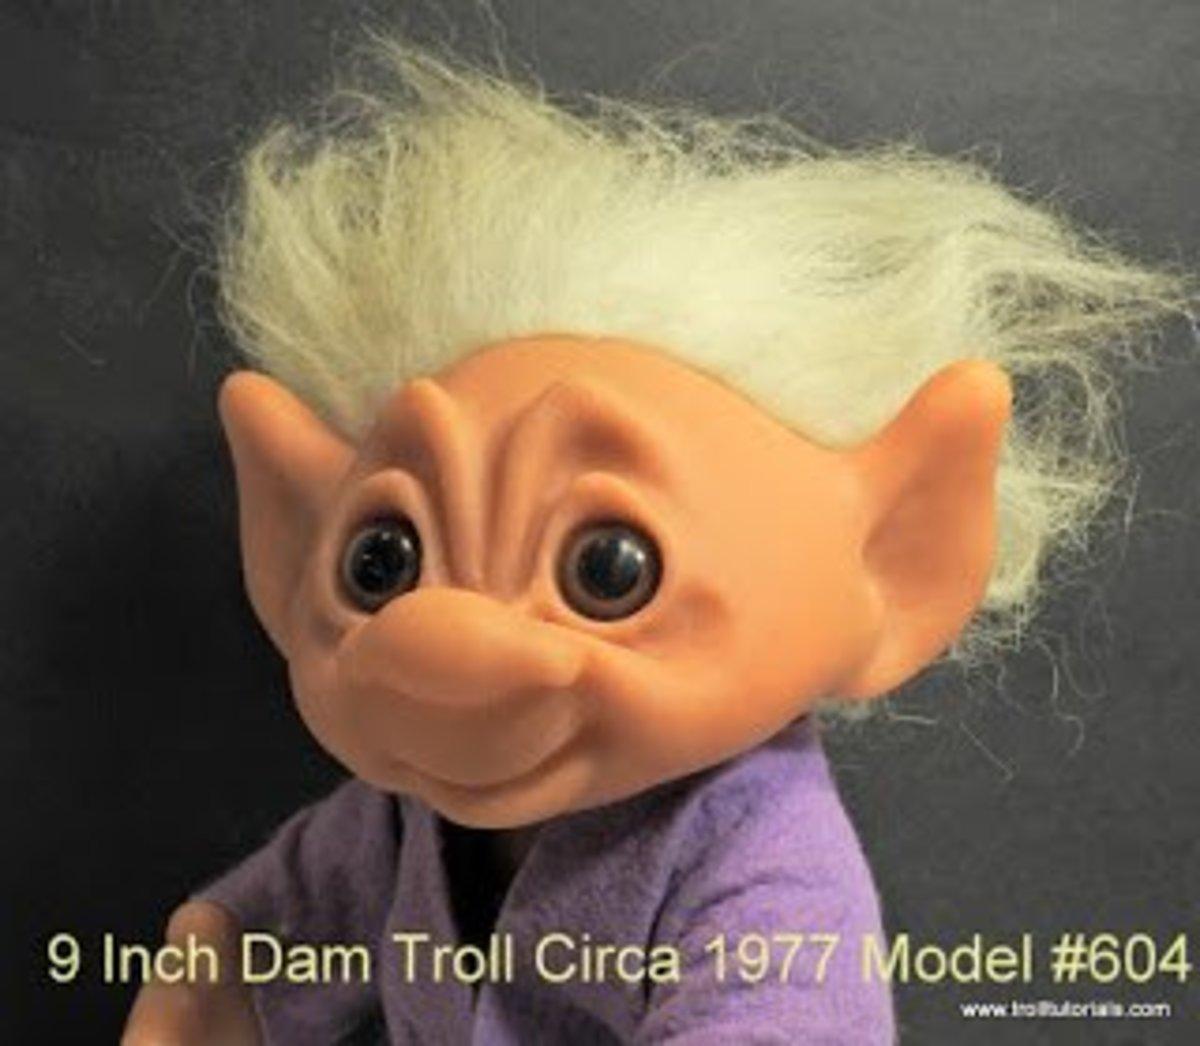 This Dam troll (circa 197) has synthetic hair.